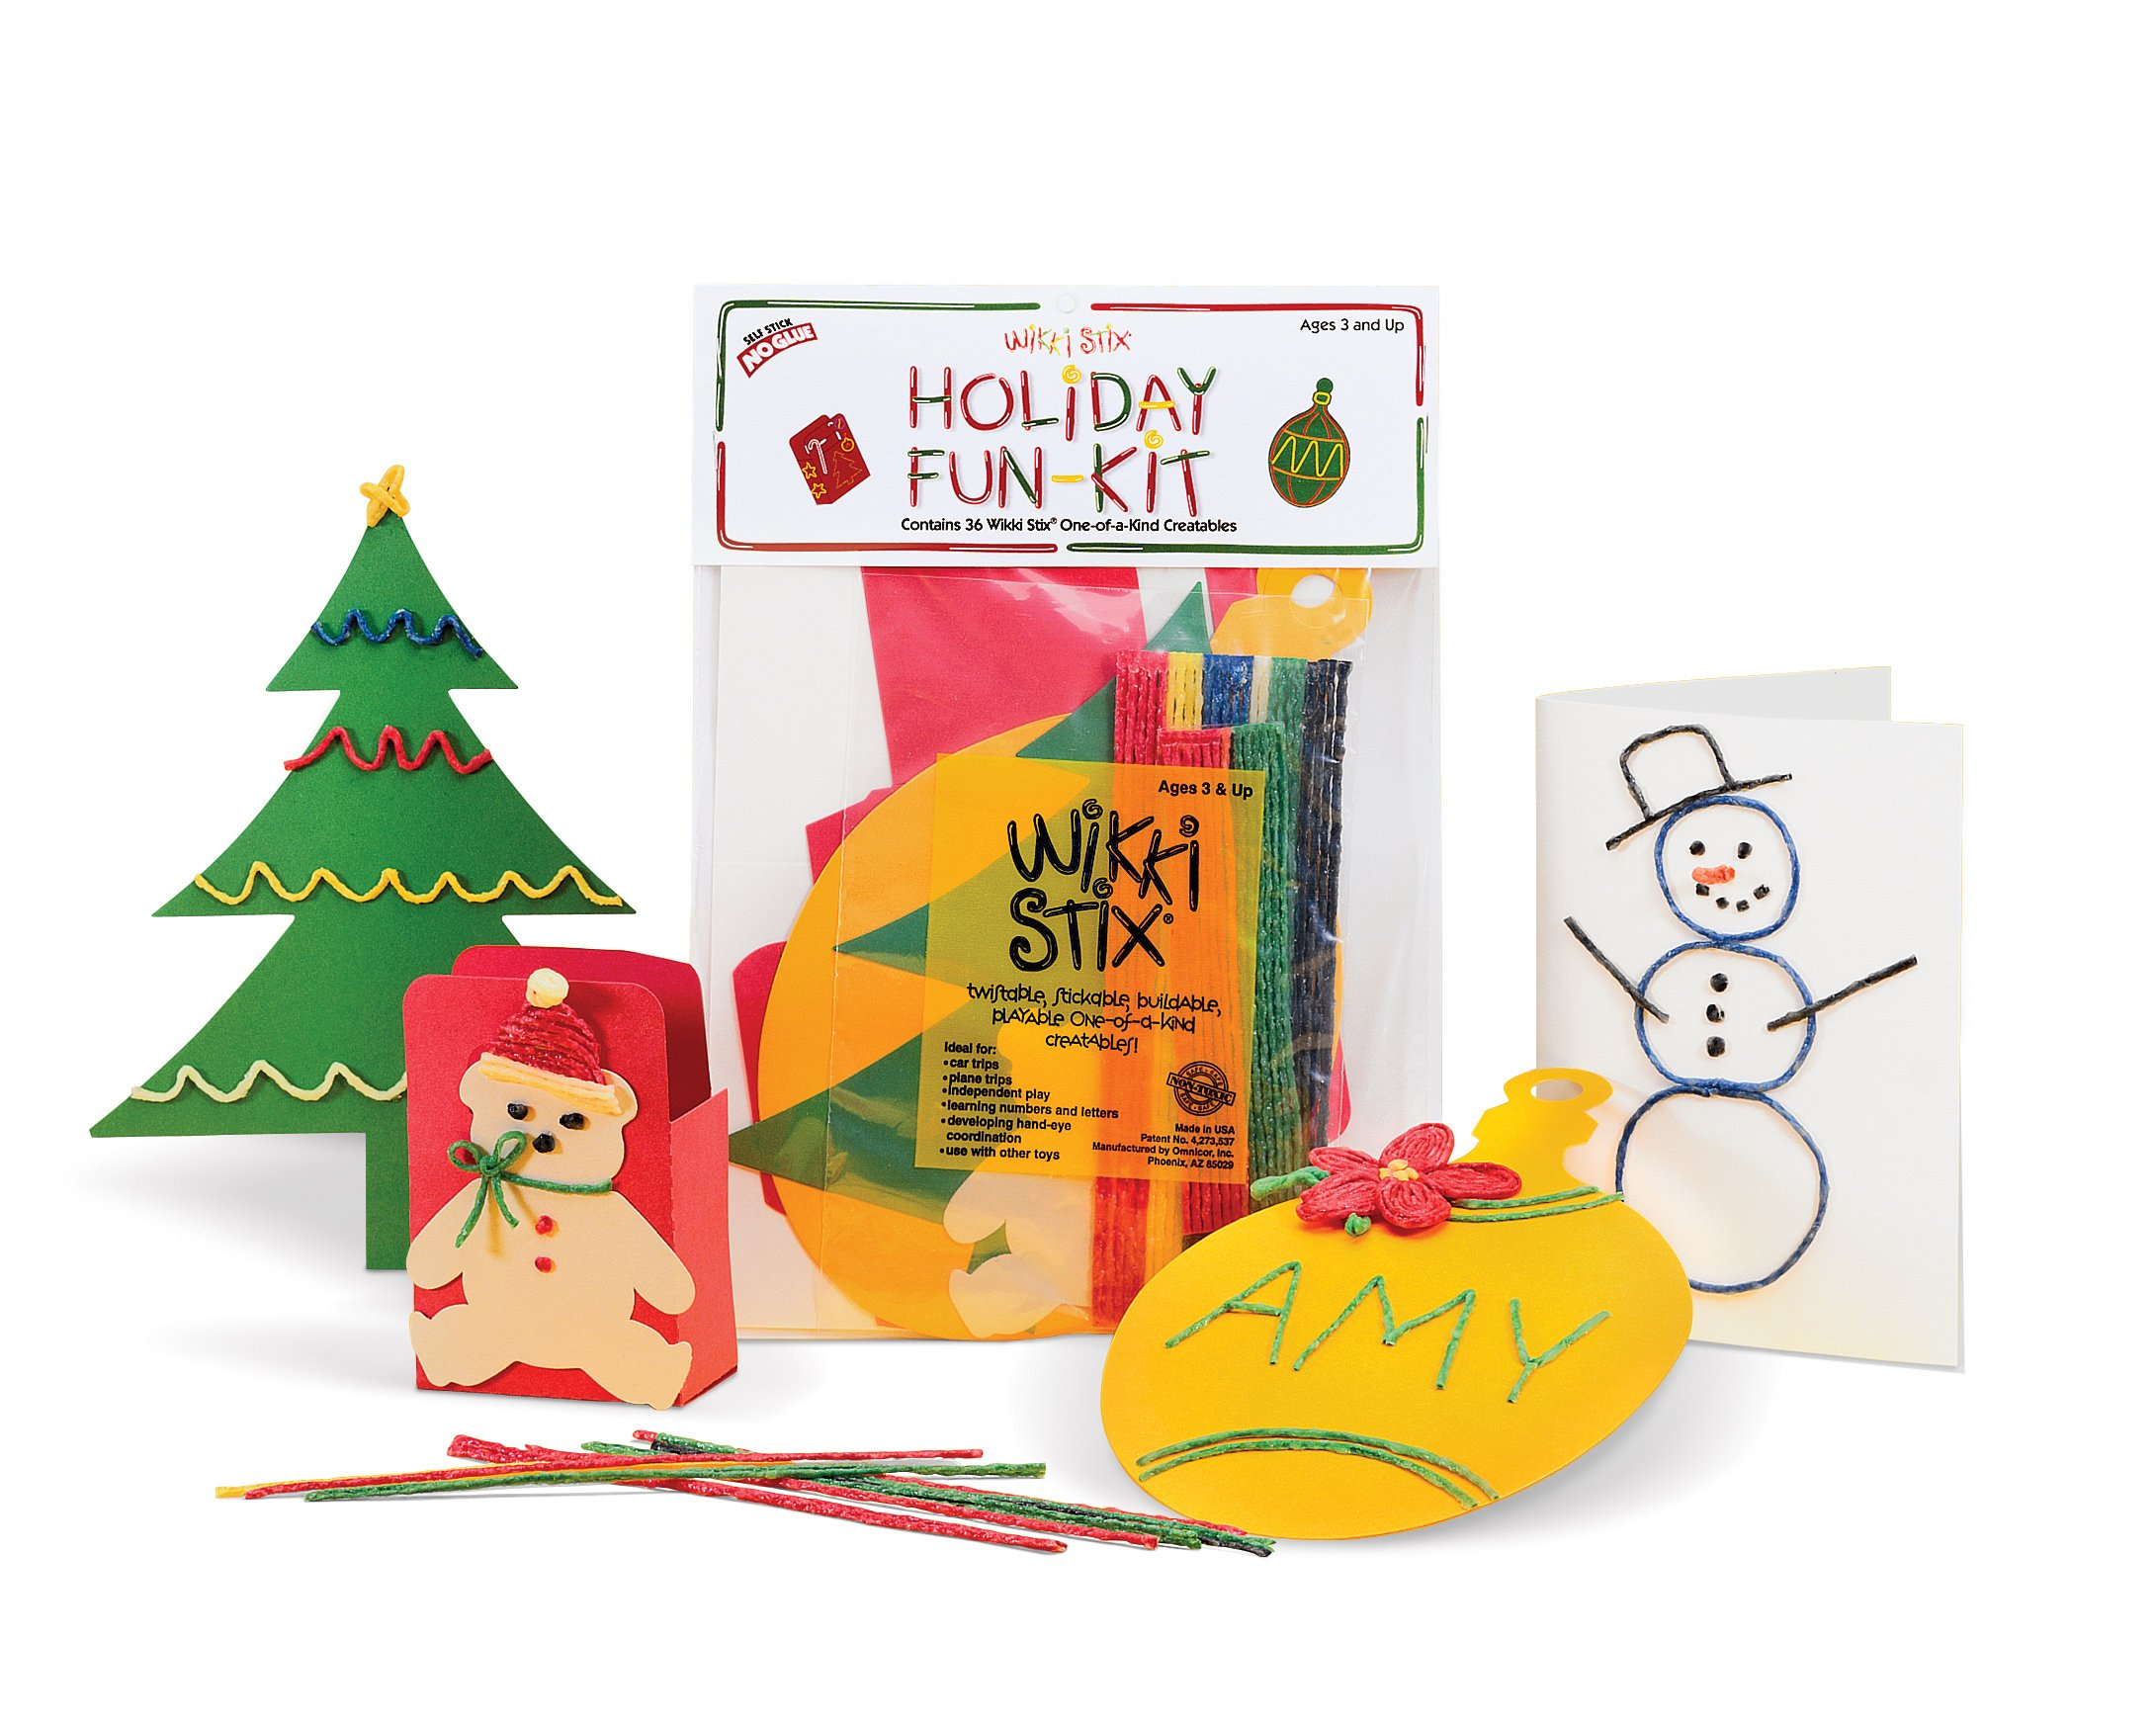 Wikki Stix Holiday Fun Kit